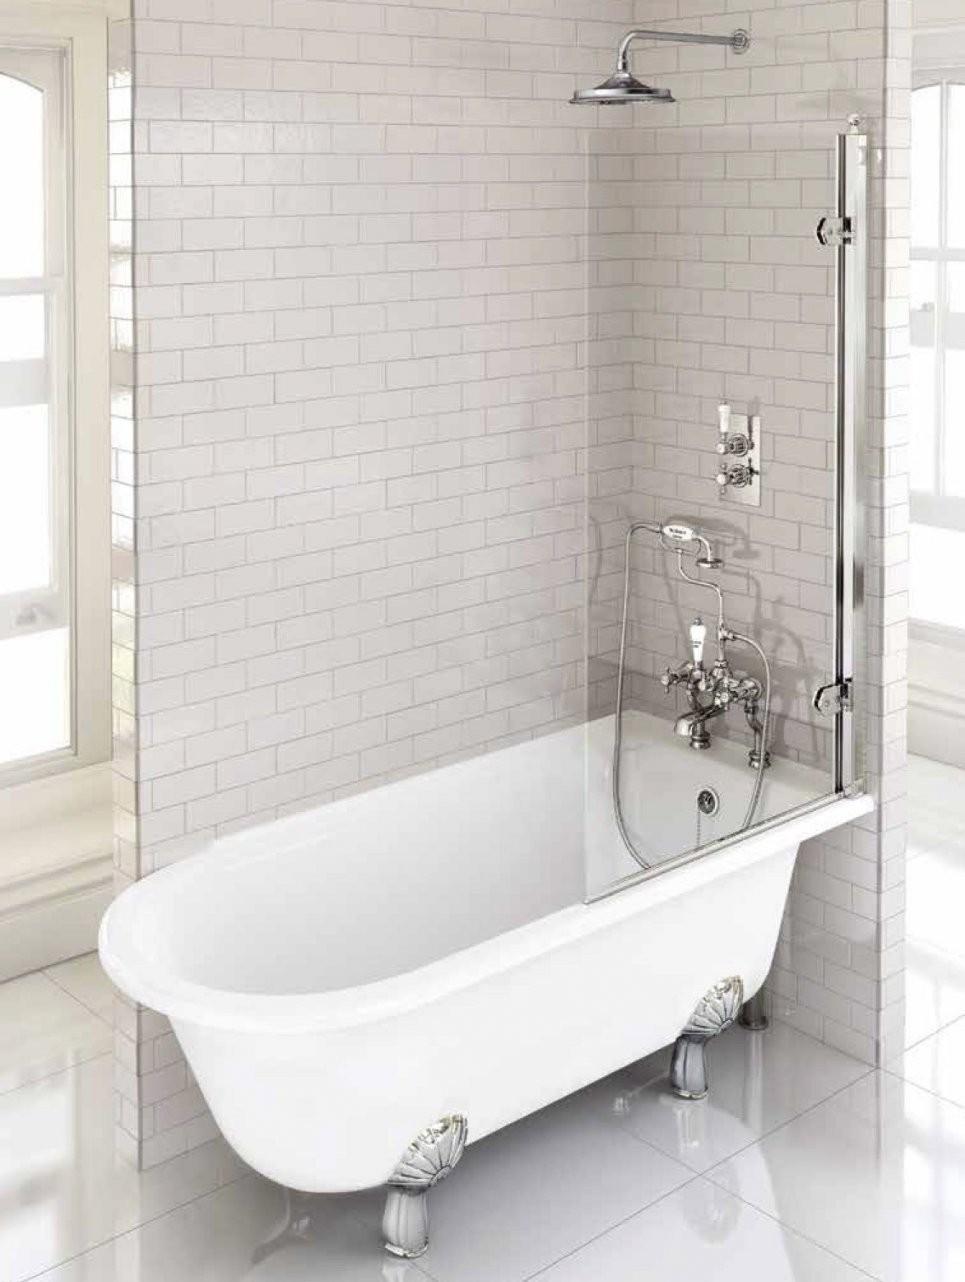 Badewanne Freistehend Antik  Retro Antik Messing Badewanne Dusche von Retro Badewanne Freistehend Bild